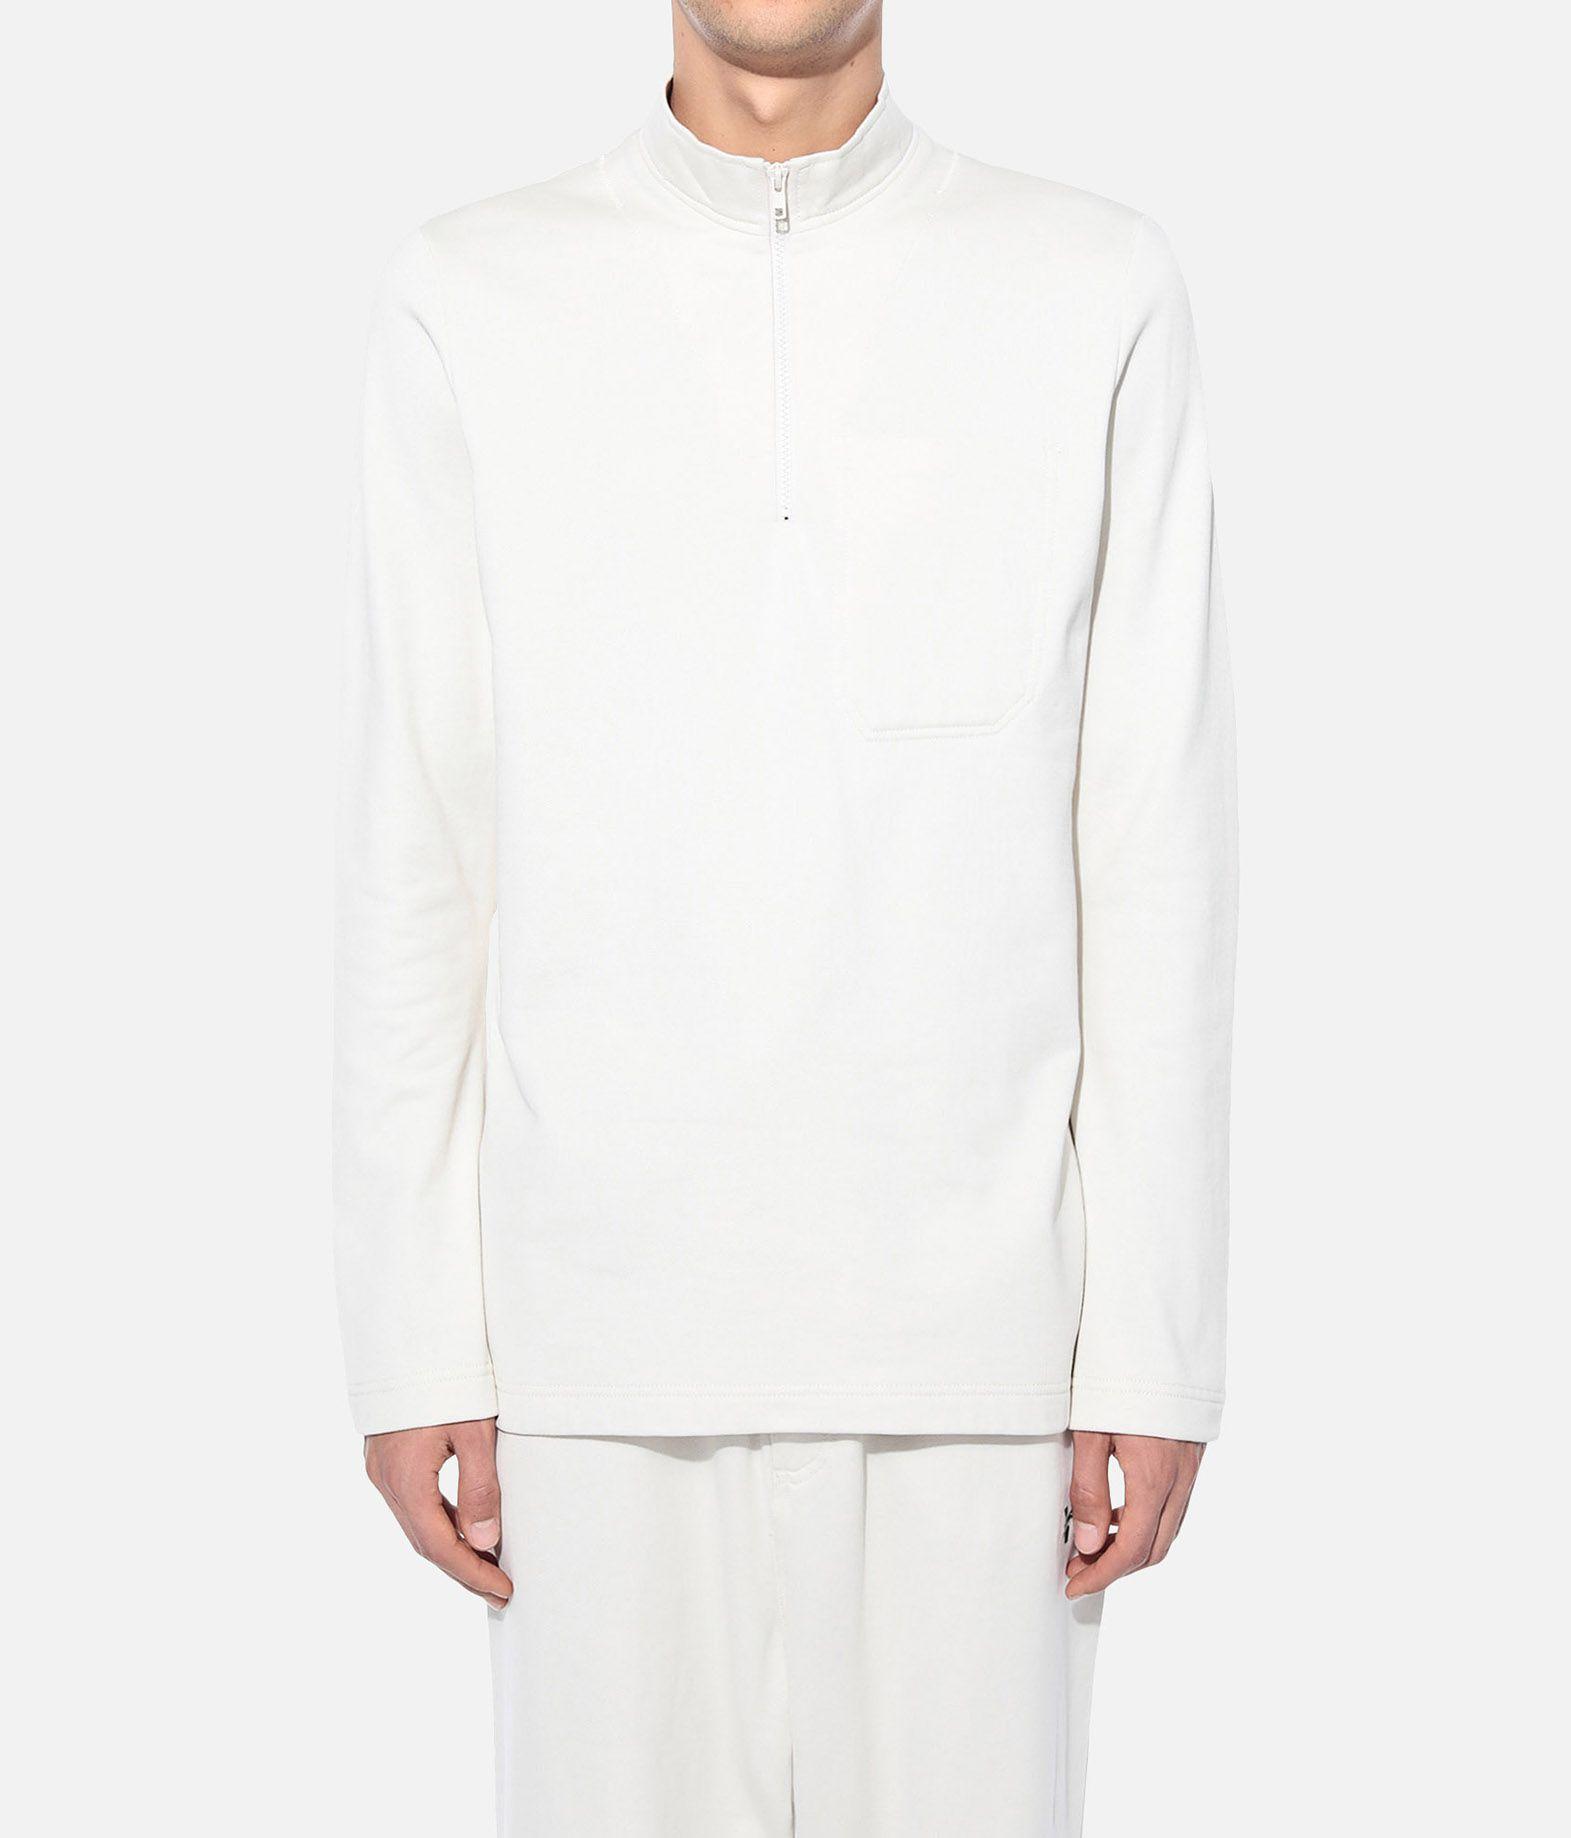 Y-3 Y-3 Sashiko Sweater Толстовка на молнии Для Мужчин r